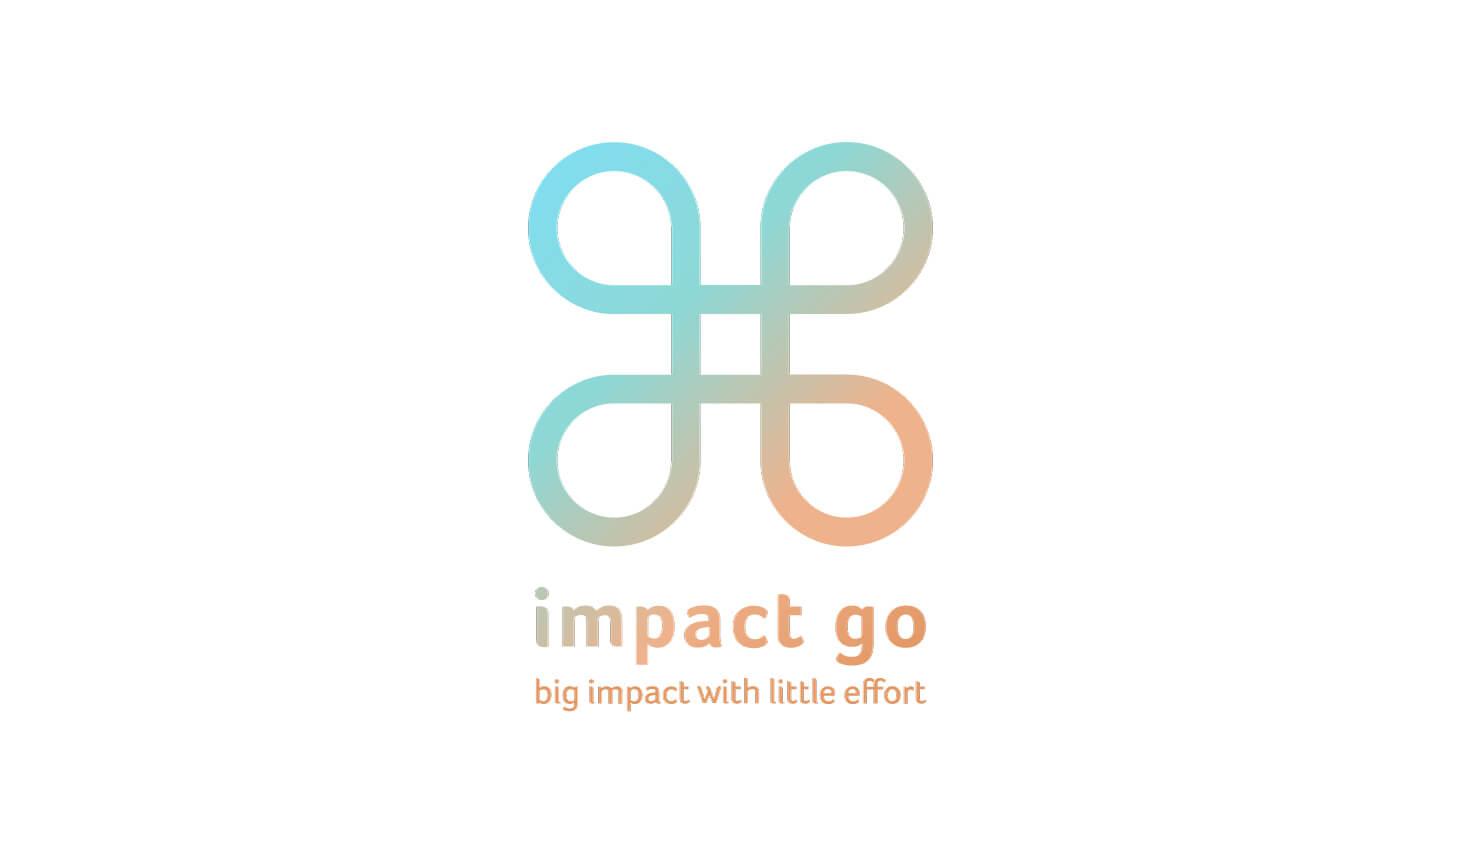 ImpactGo_logo_branding